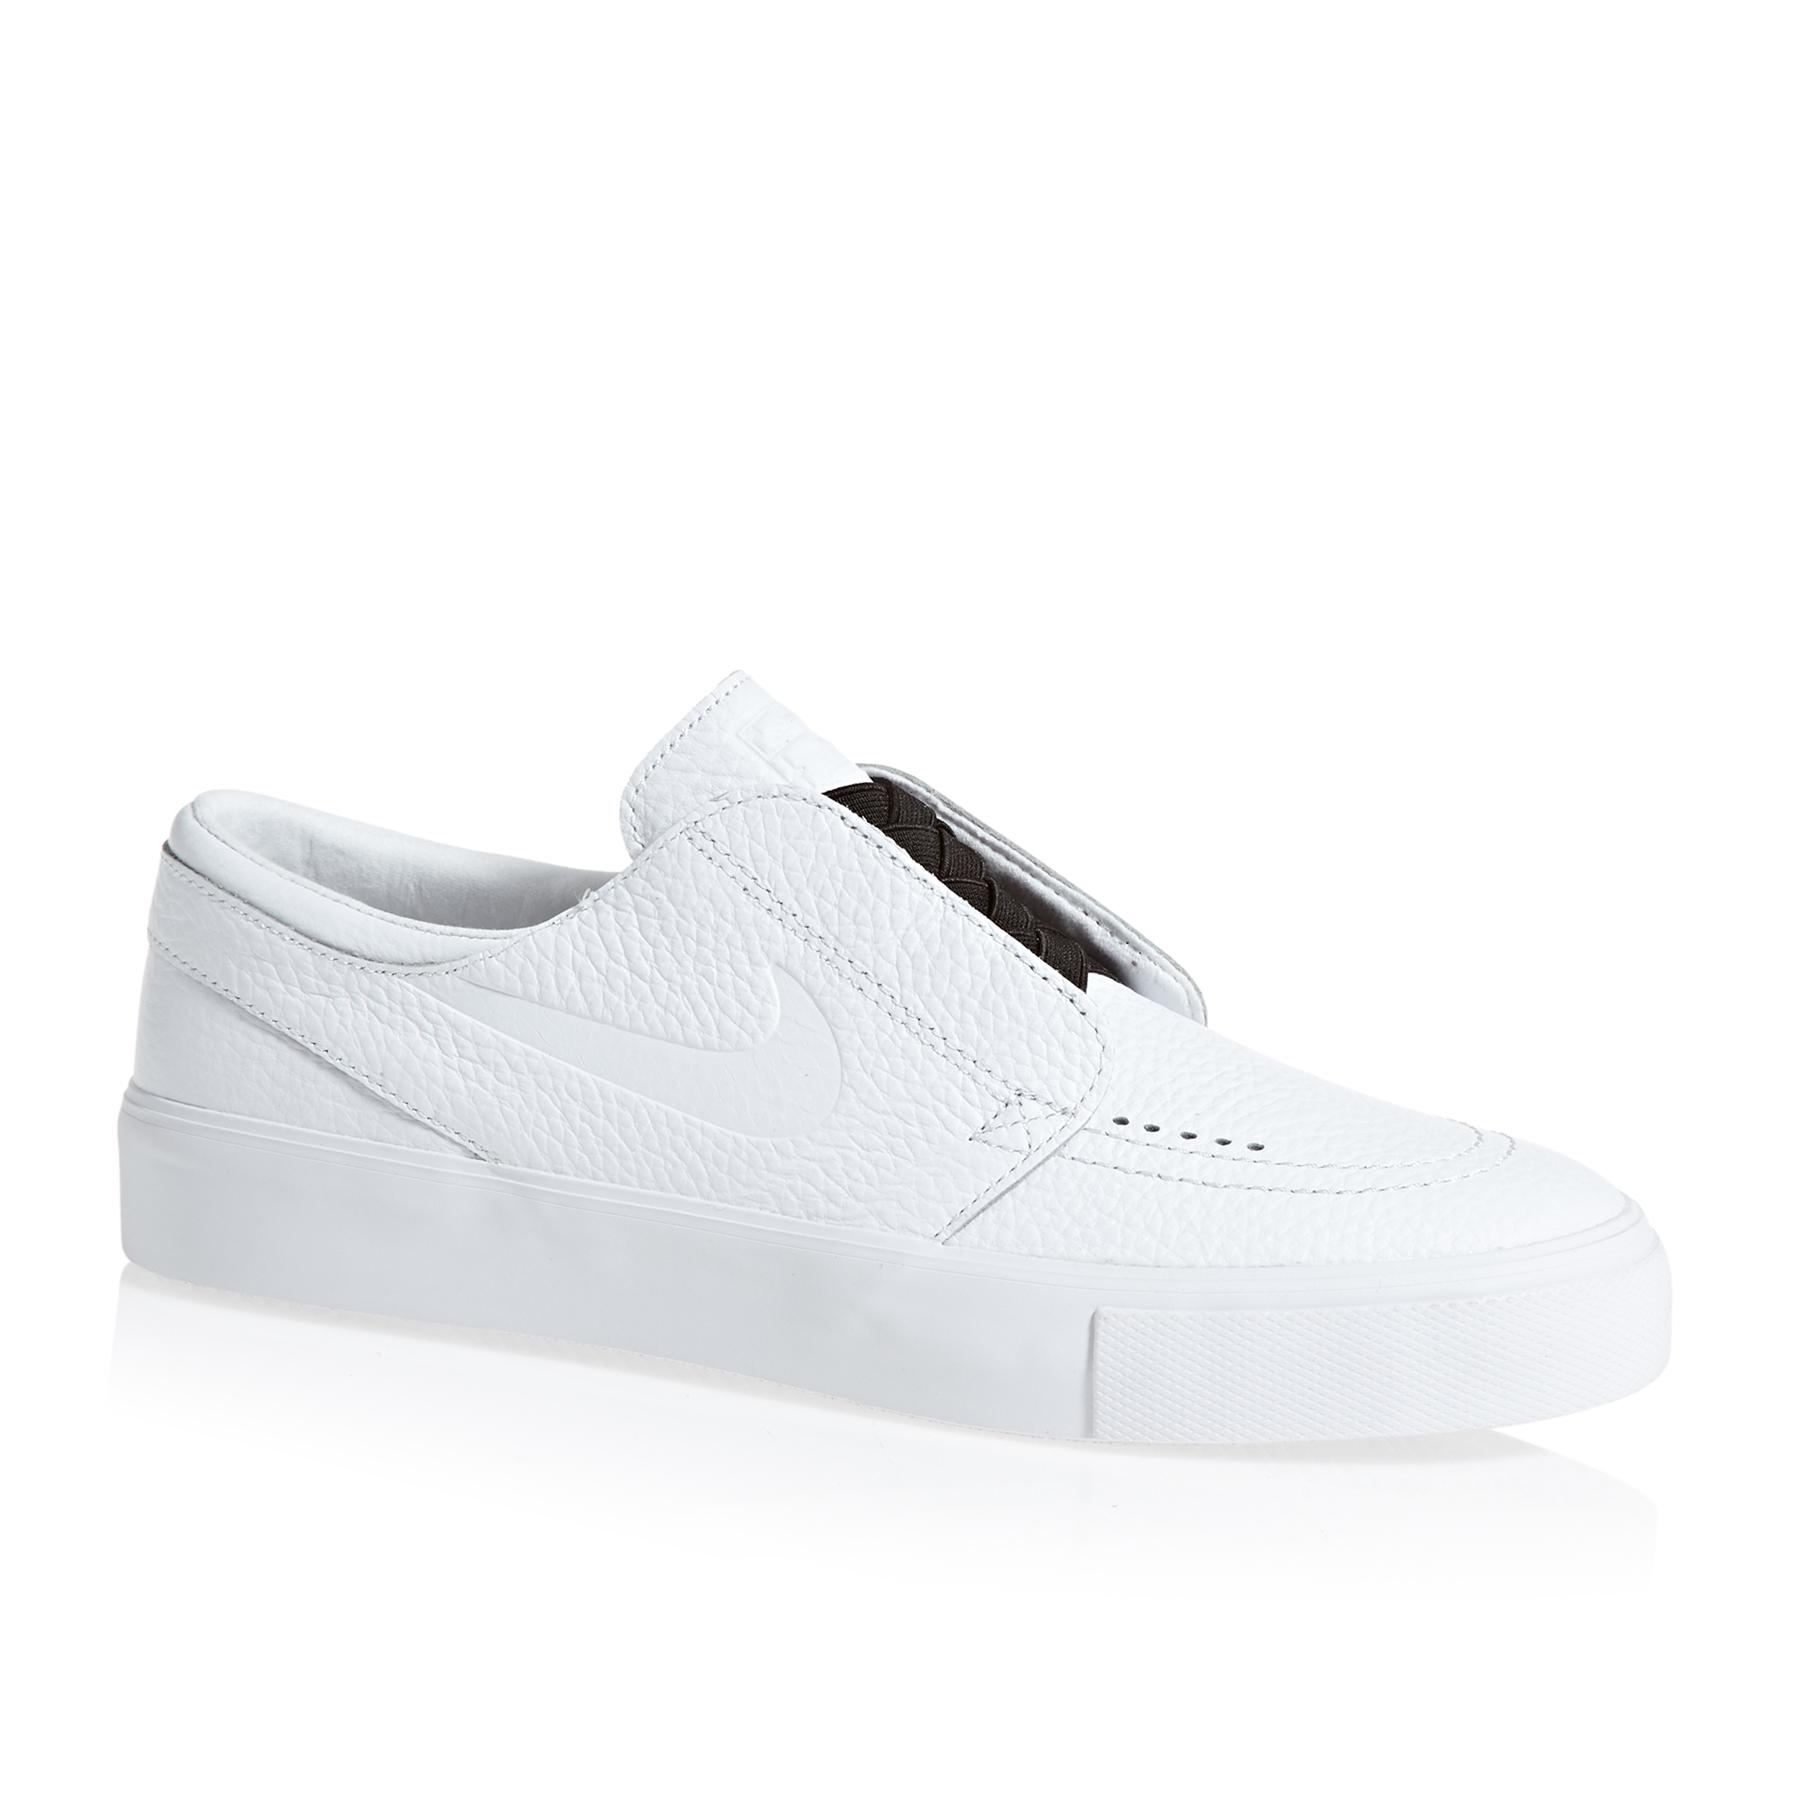 Scarpe Nike SB Zoom Janoski HT Slip On disponibile su